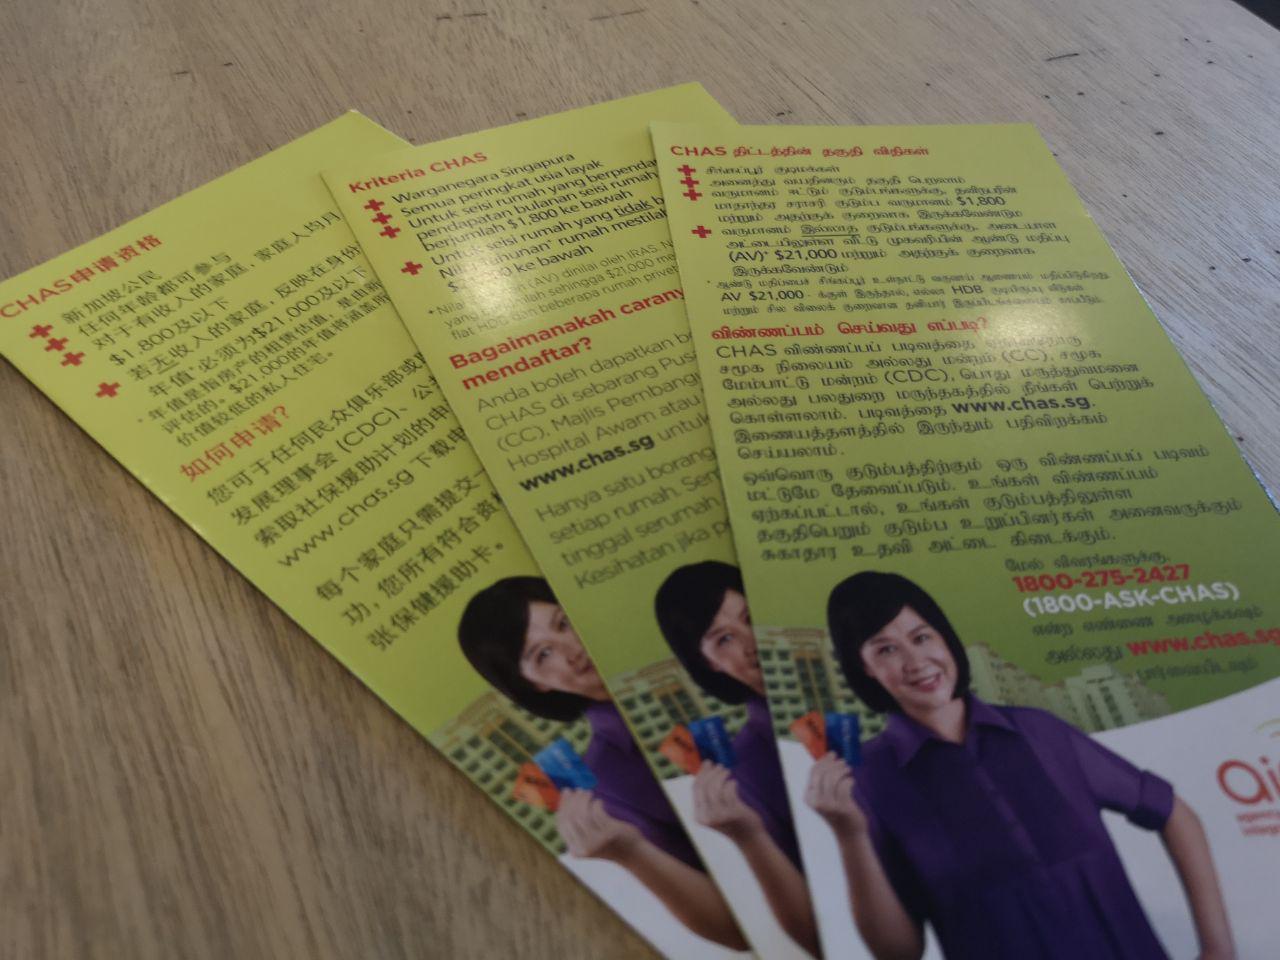 Brochures in Mandarin, Malay and Tamil